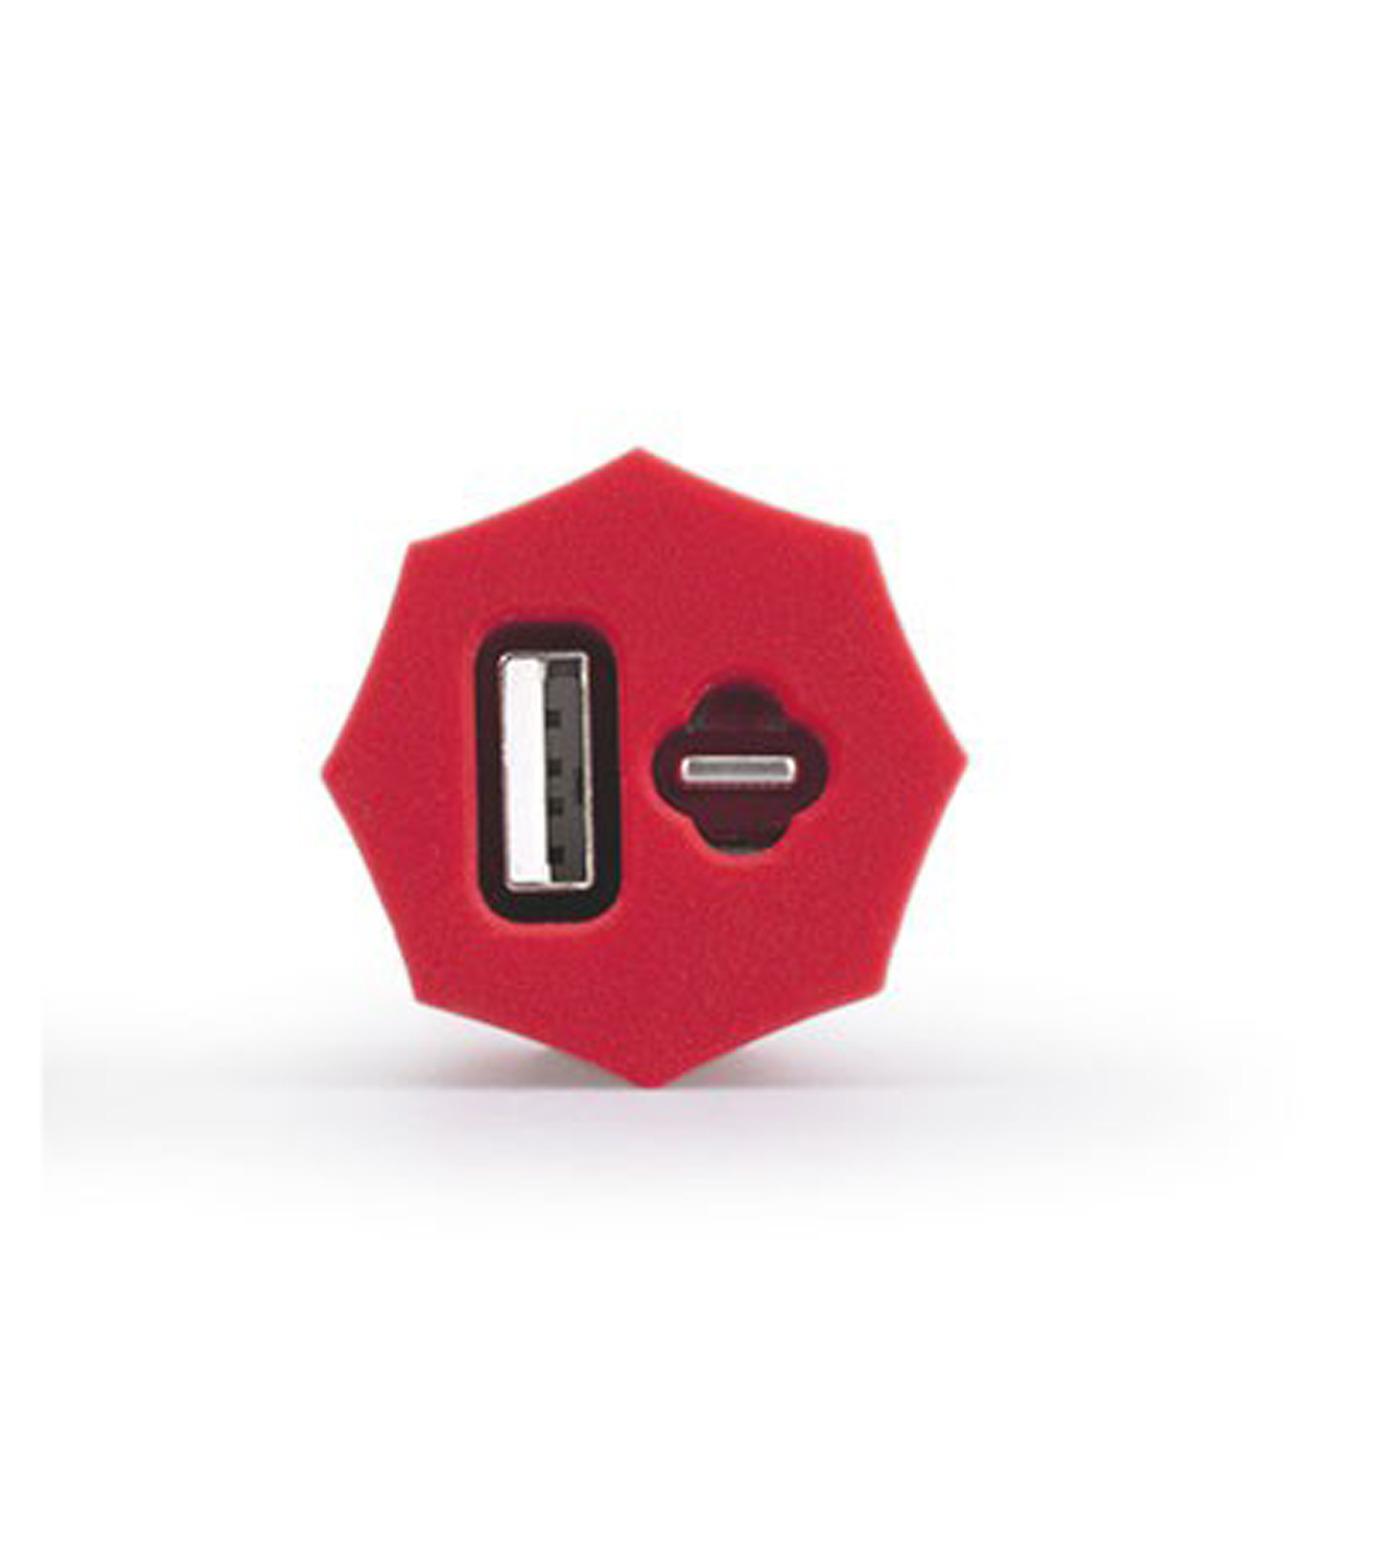 Tunewear(チューンウエア)のCableArt Lantern-RED(ガジェット/gadgets)-TUN-OT-0023-62 拡大詳細画像2